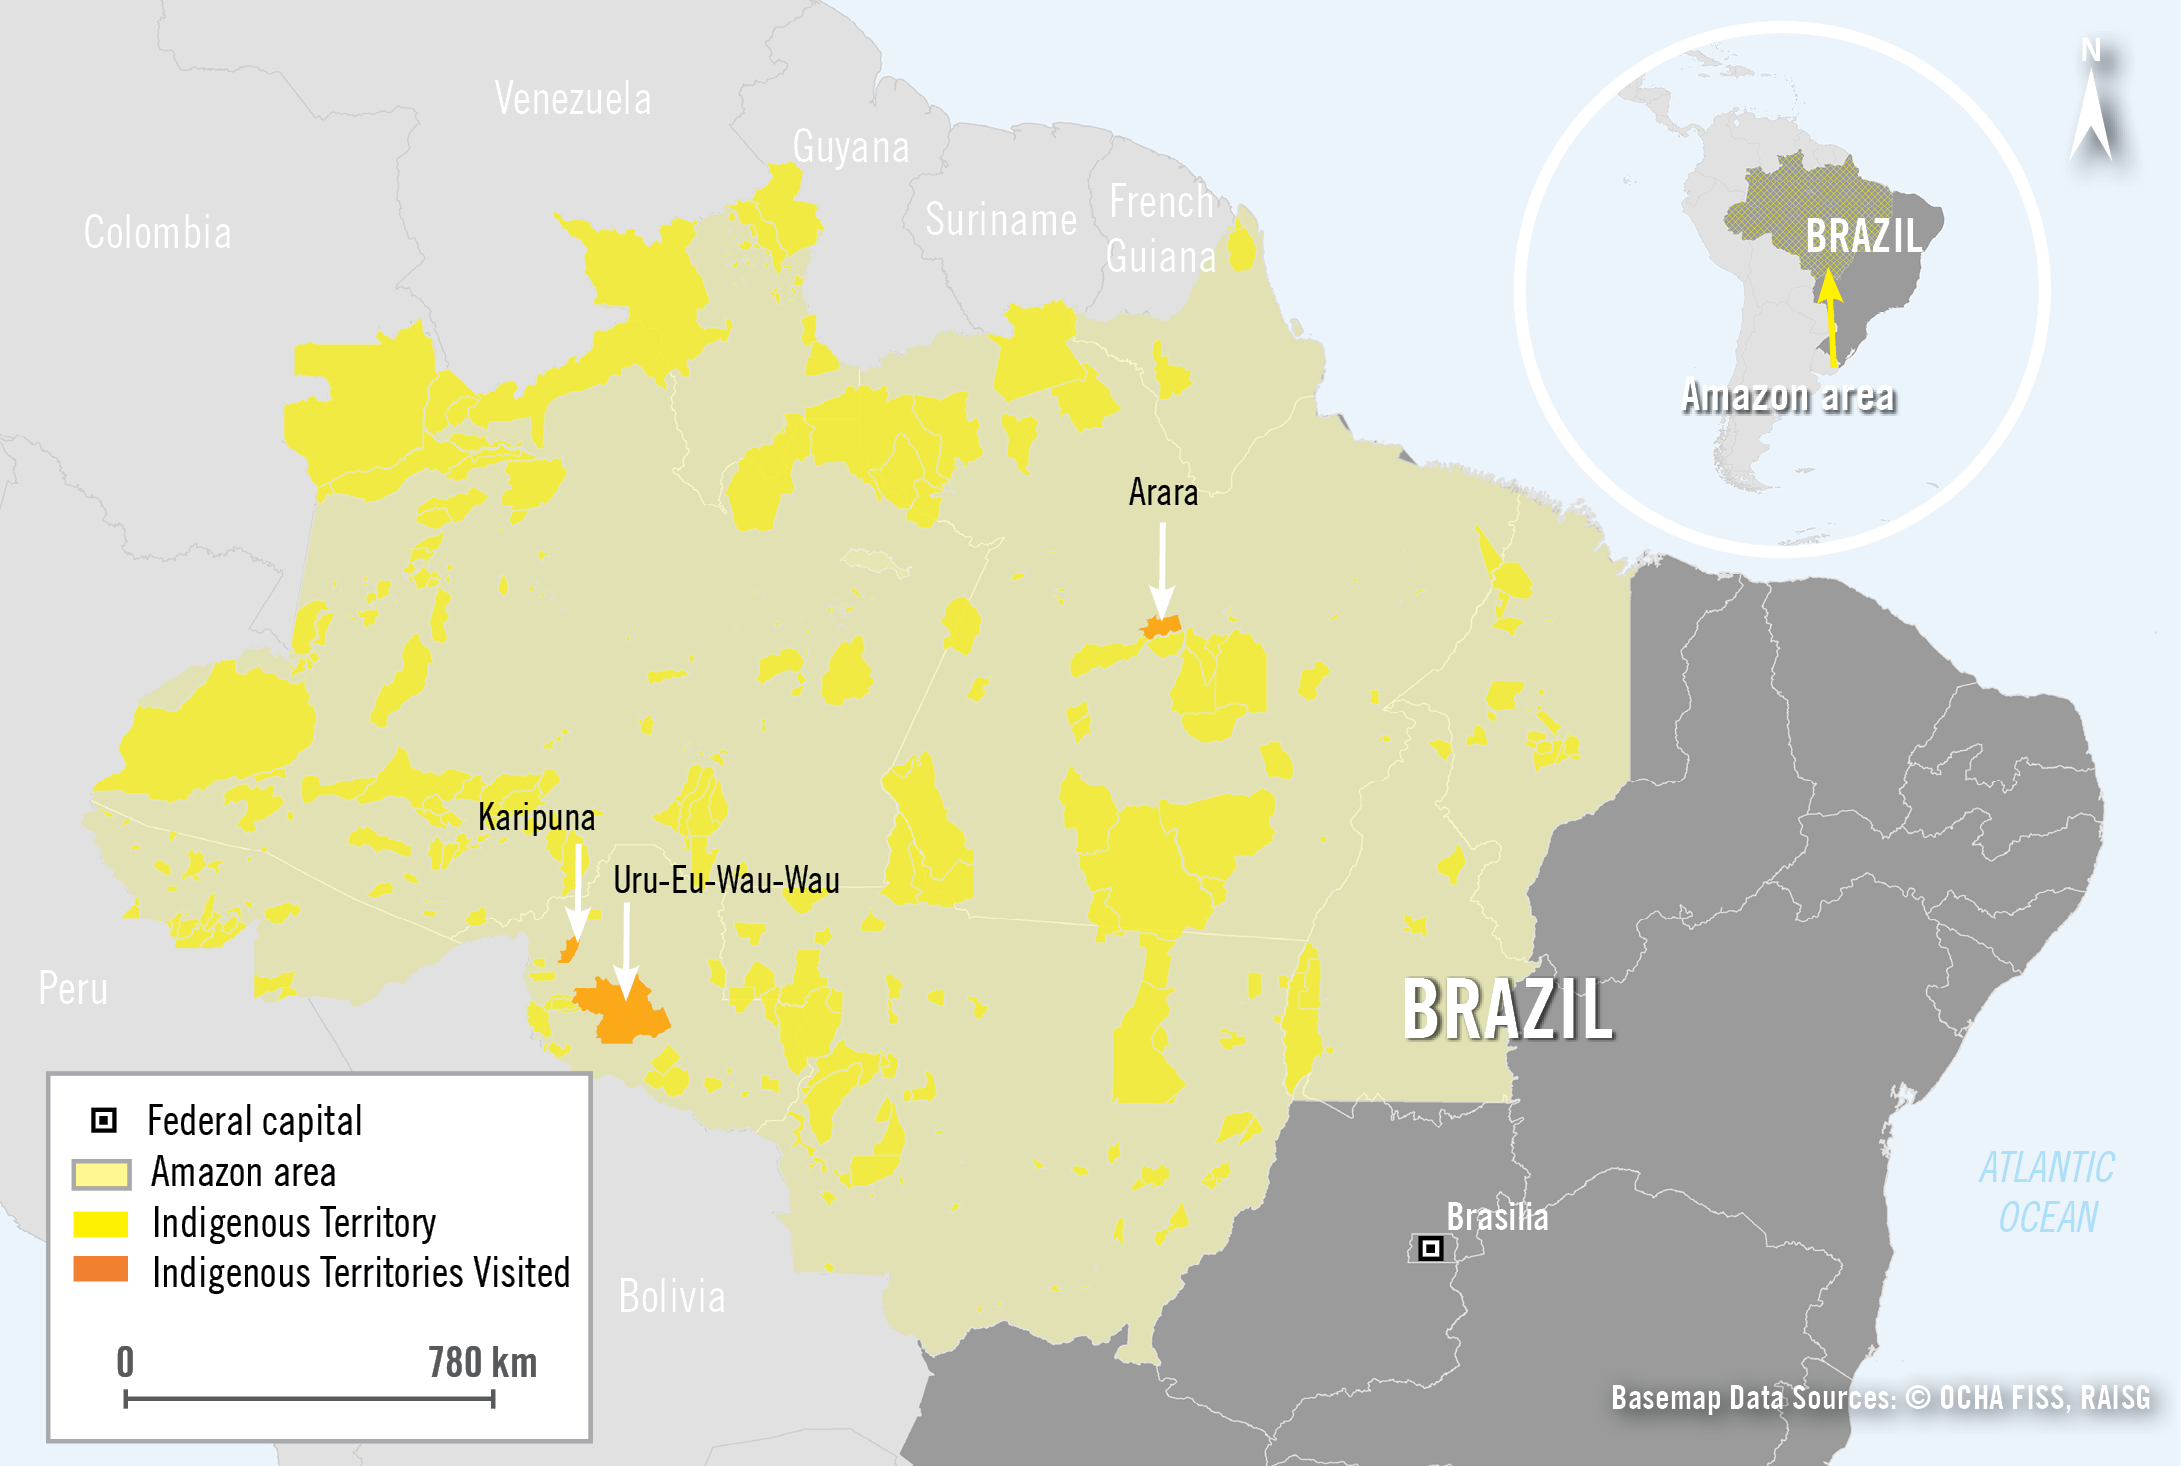 © Basemap data sources OCHA FISS, RAISG/Amnesty Interntional